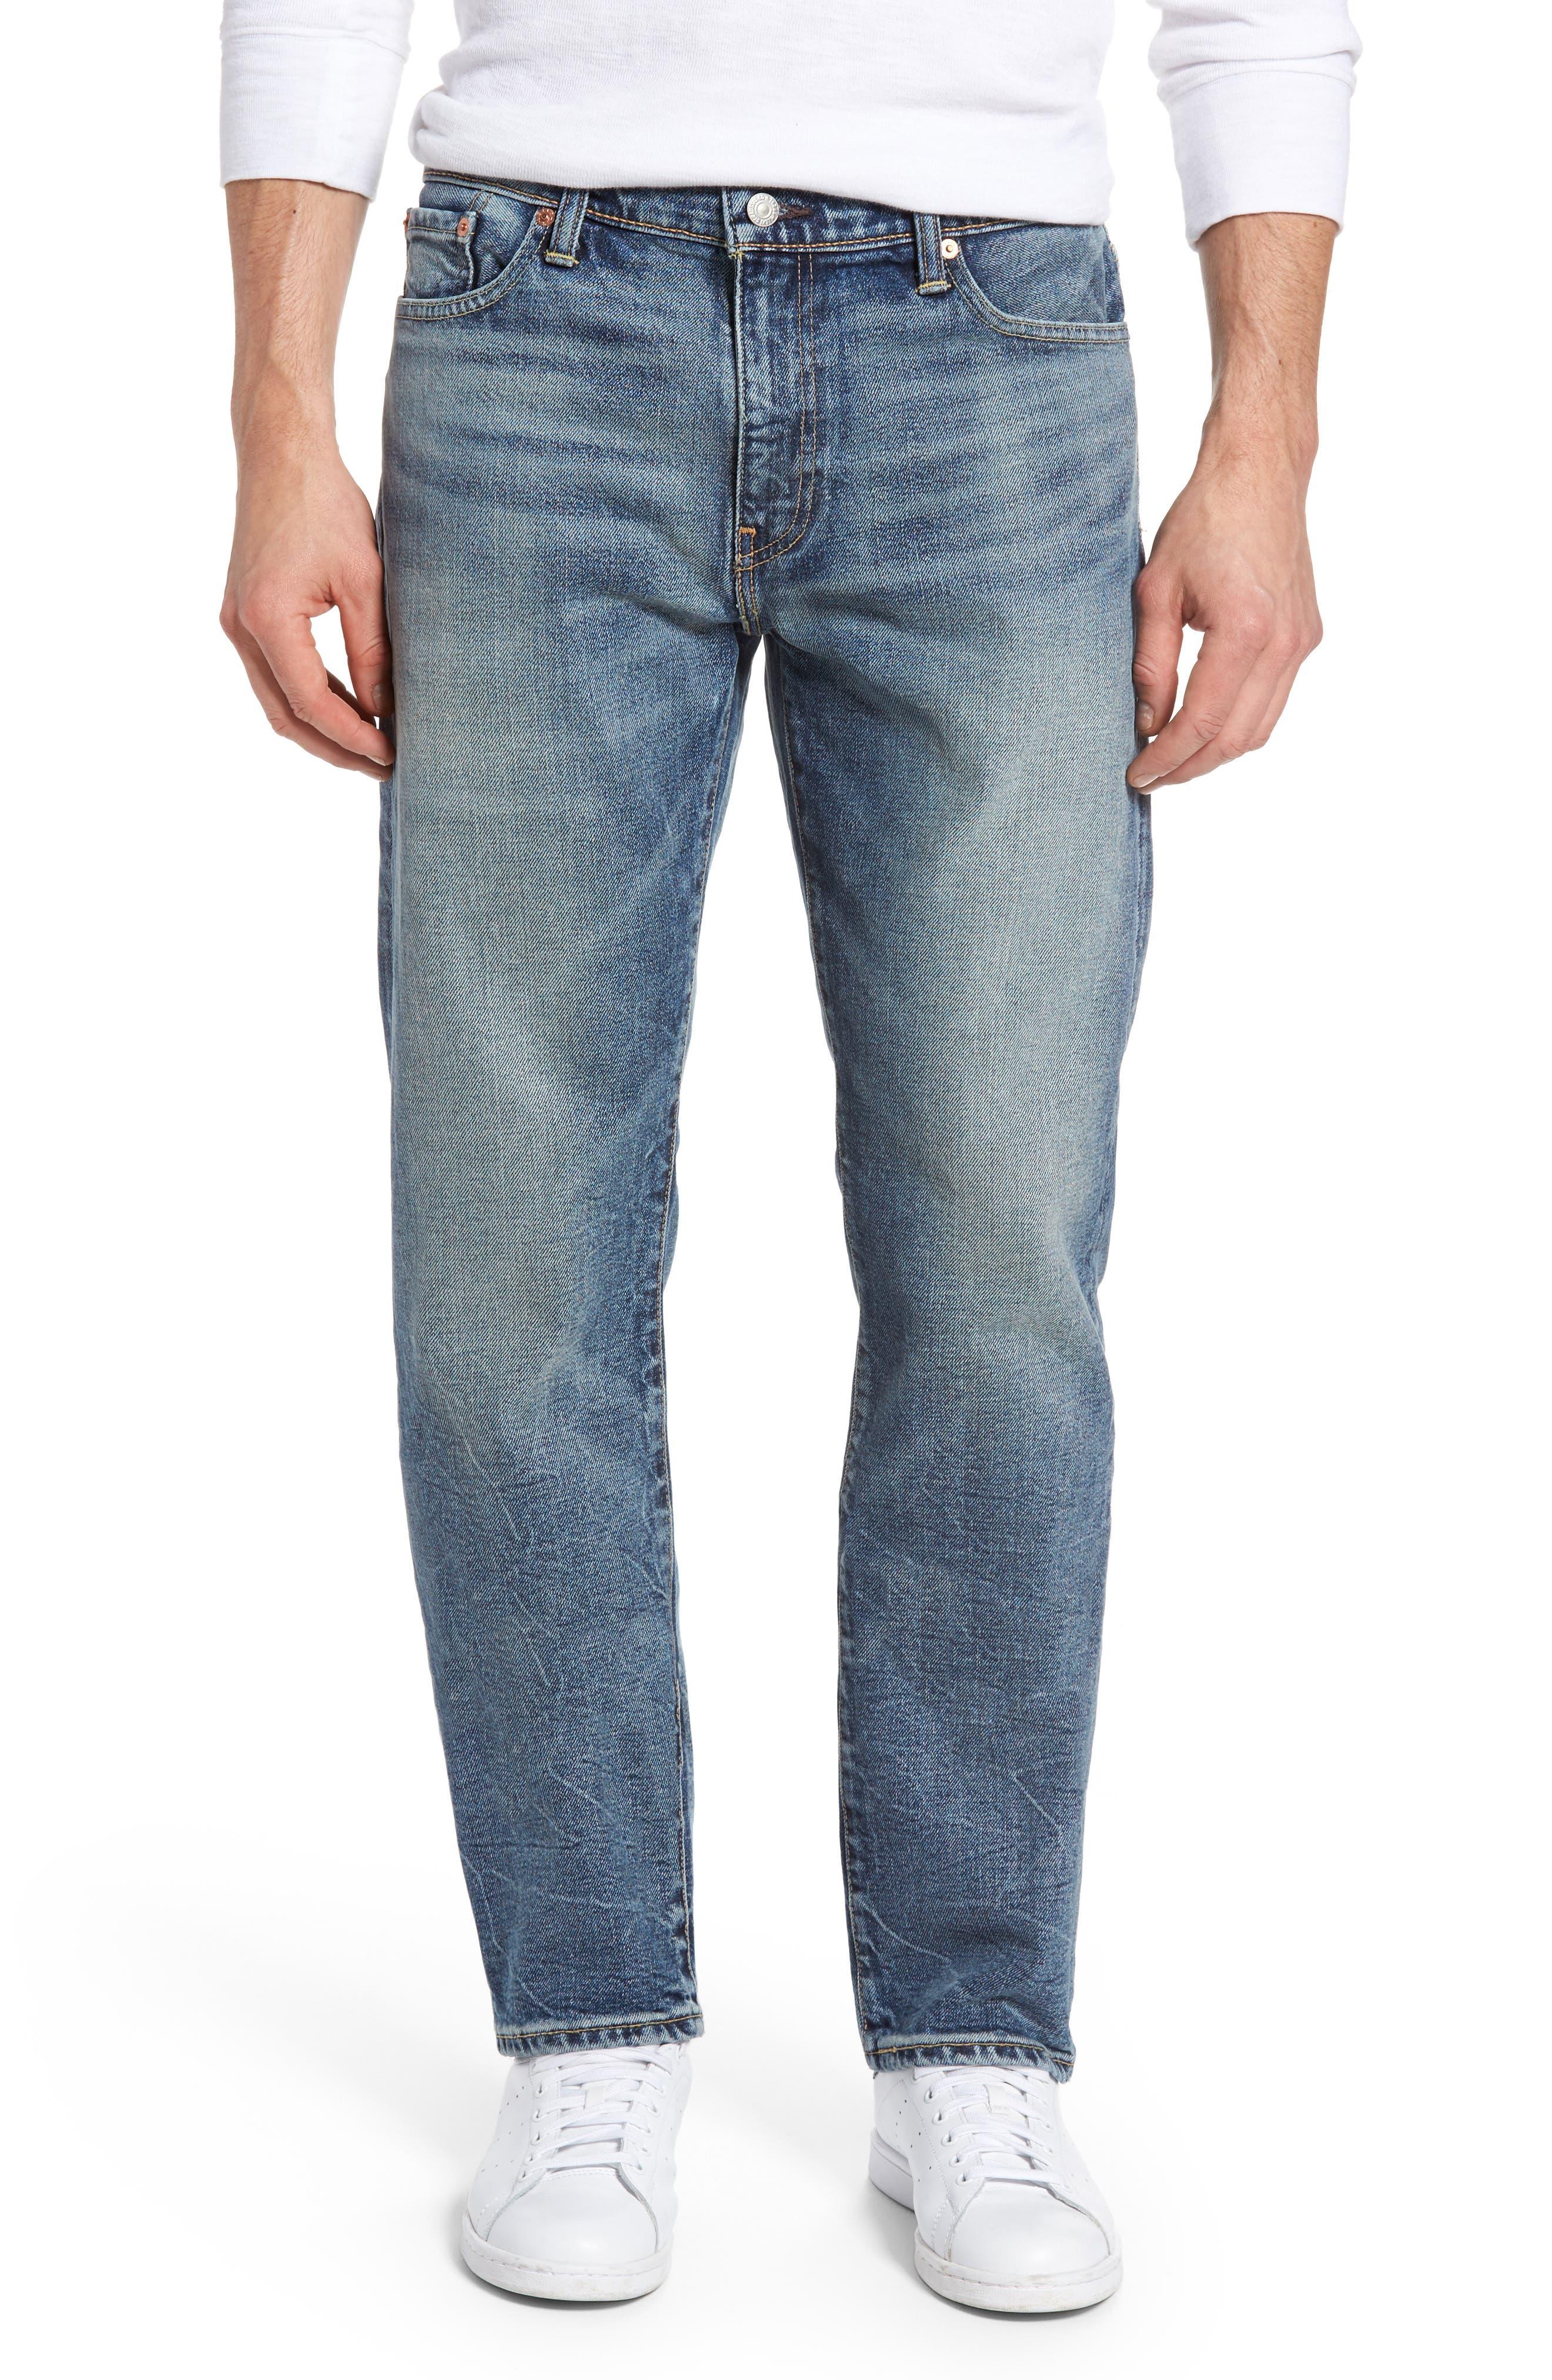 Alternate Image 1 Selected - Levi's® 513™ Slim Straight Leg Jeans (Danz)